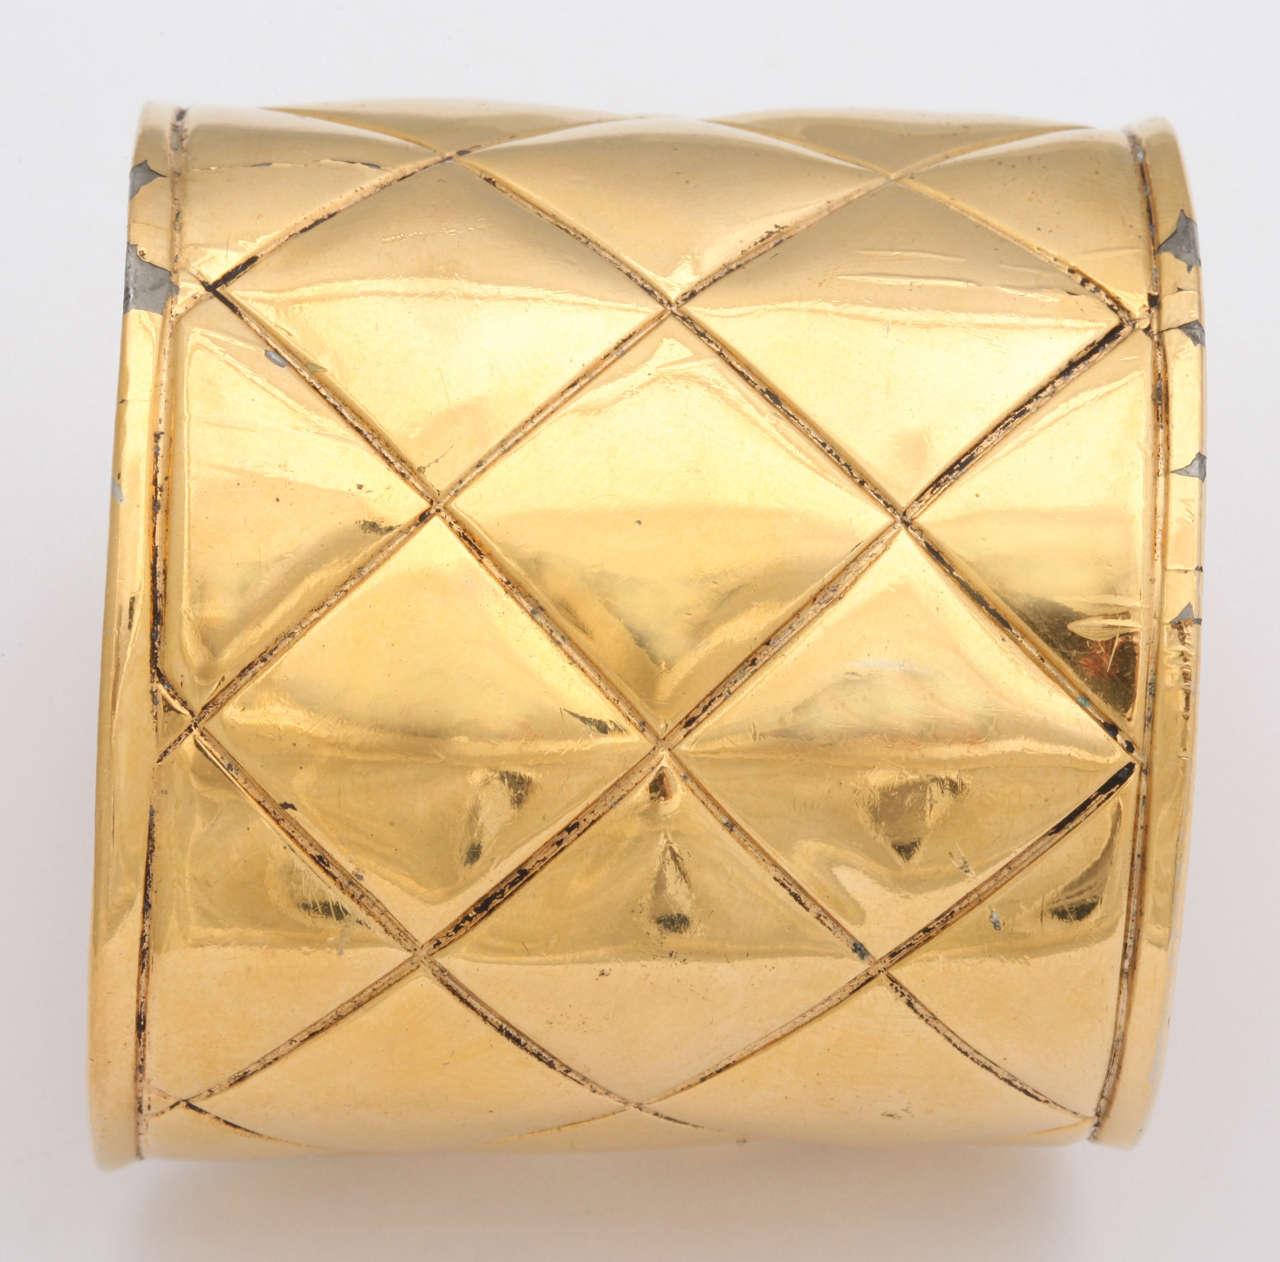 Chanel Quilted Bangle Bracelet 3